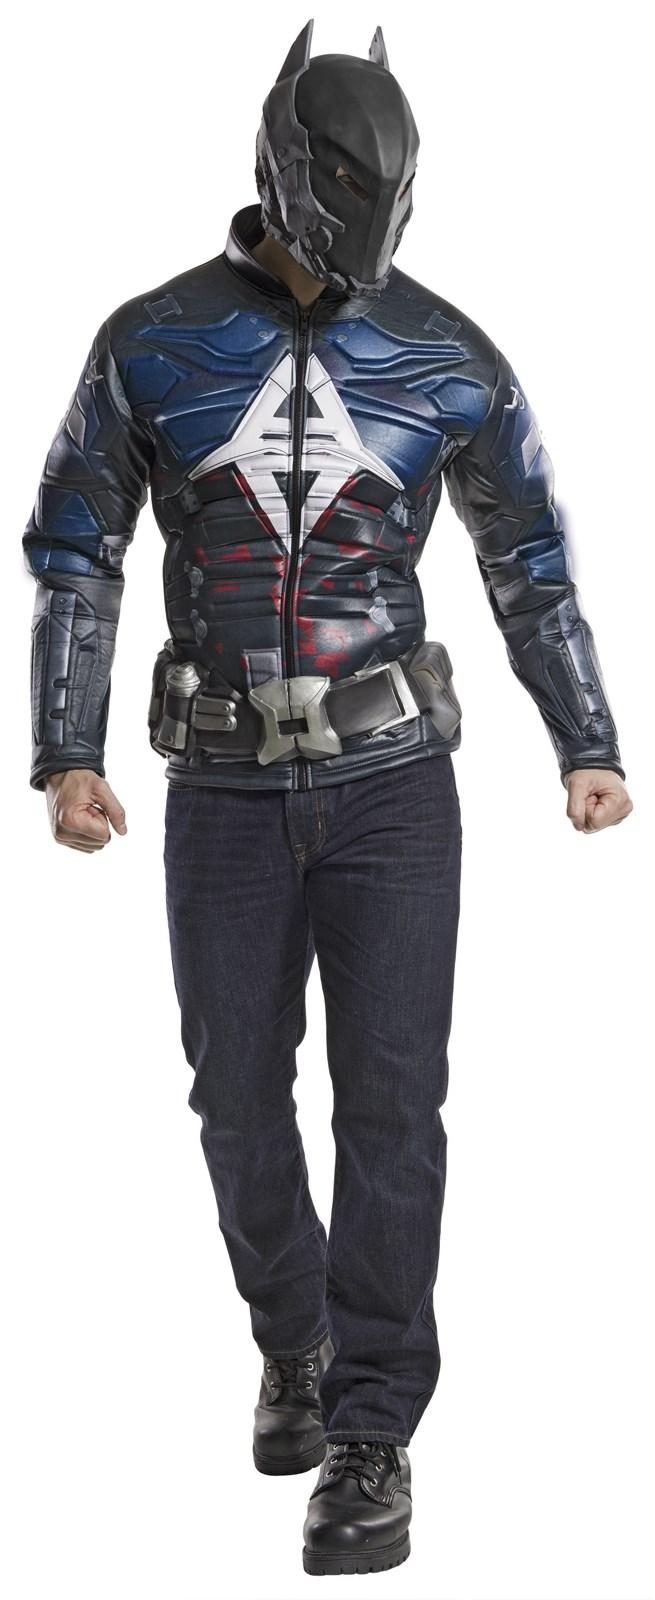 Adult Batman Arkham Knight Muscle Chest Costume | BuyCostumes.com